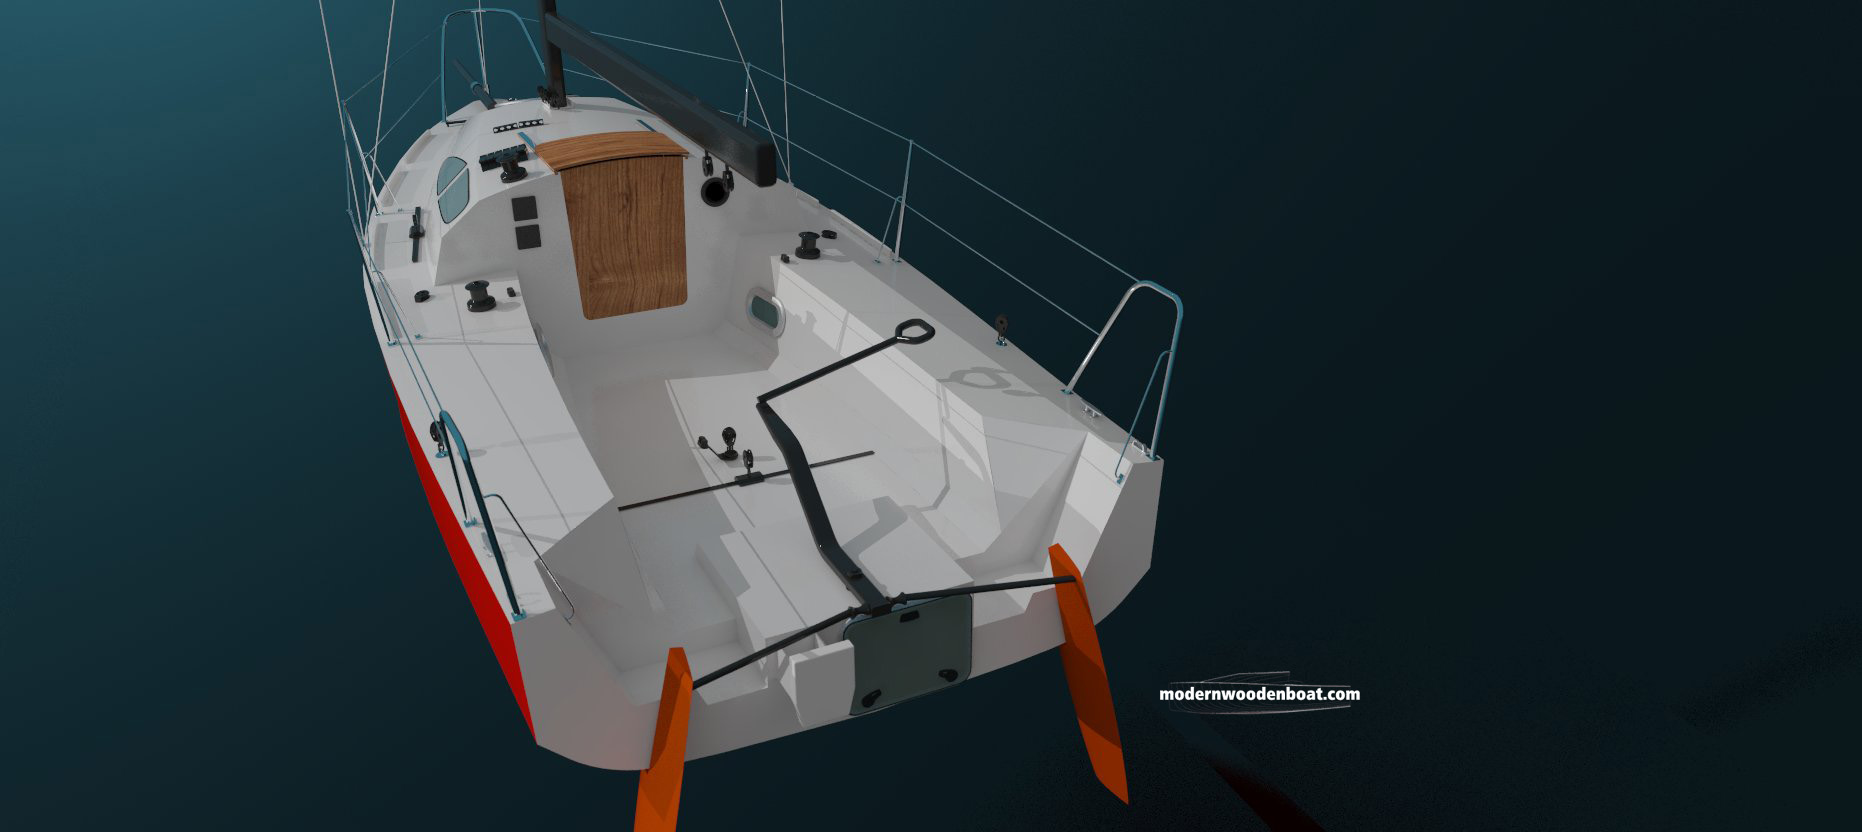 idea-21-radiuschine-epoxy-plywood-sportboat-03